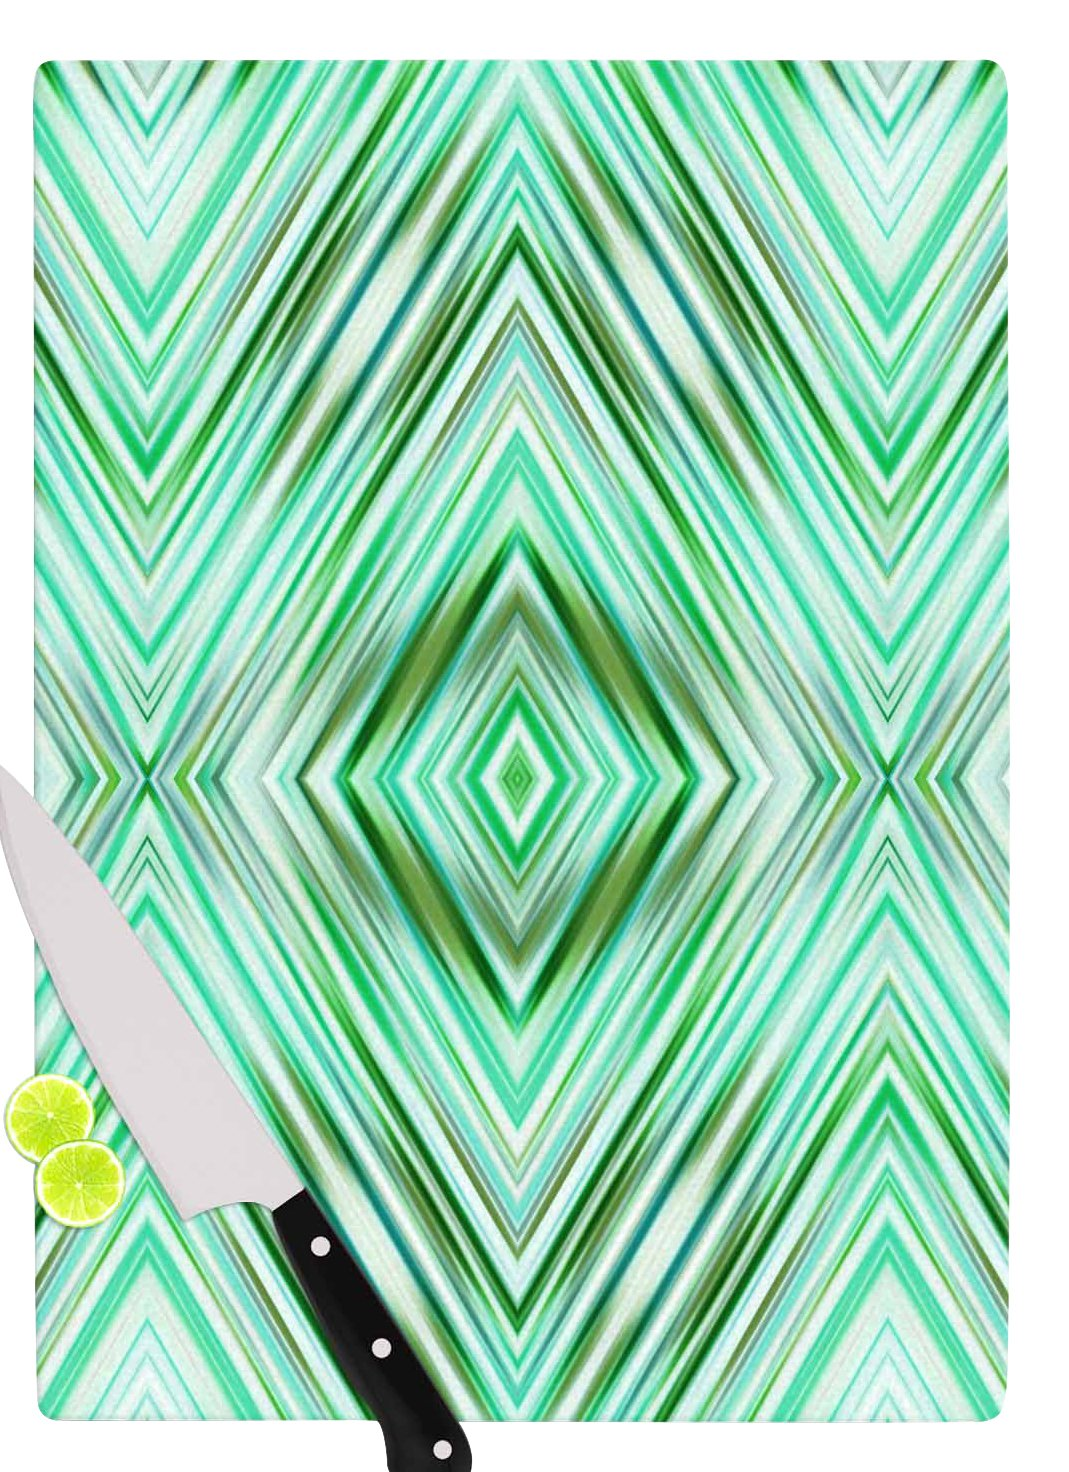 Multi KESS InHouse DR1041ACB01 Dawid RocGreen Mint Modern Ethnic Green Geometric Cutting Board 11.5 x 8.25